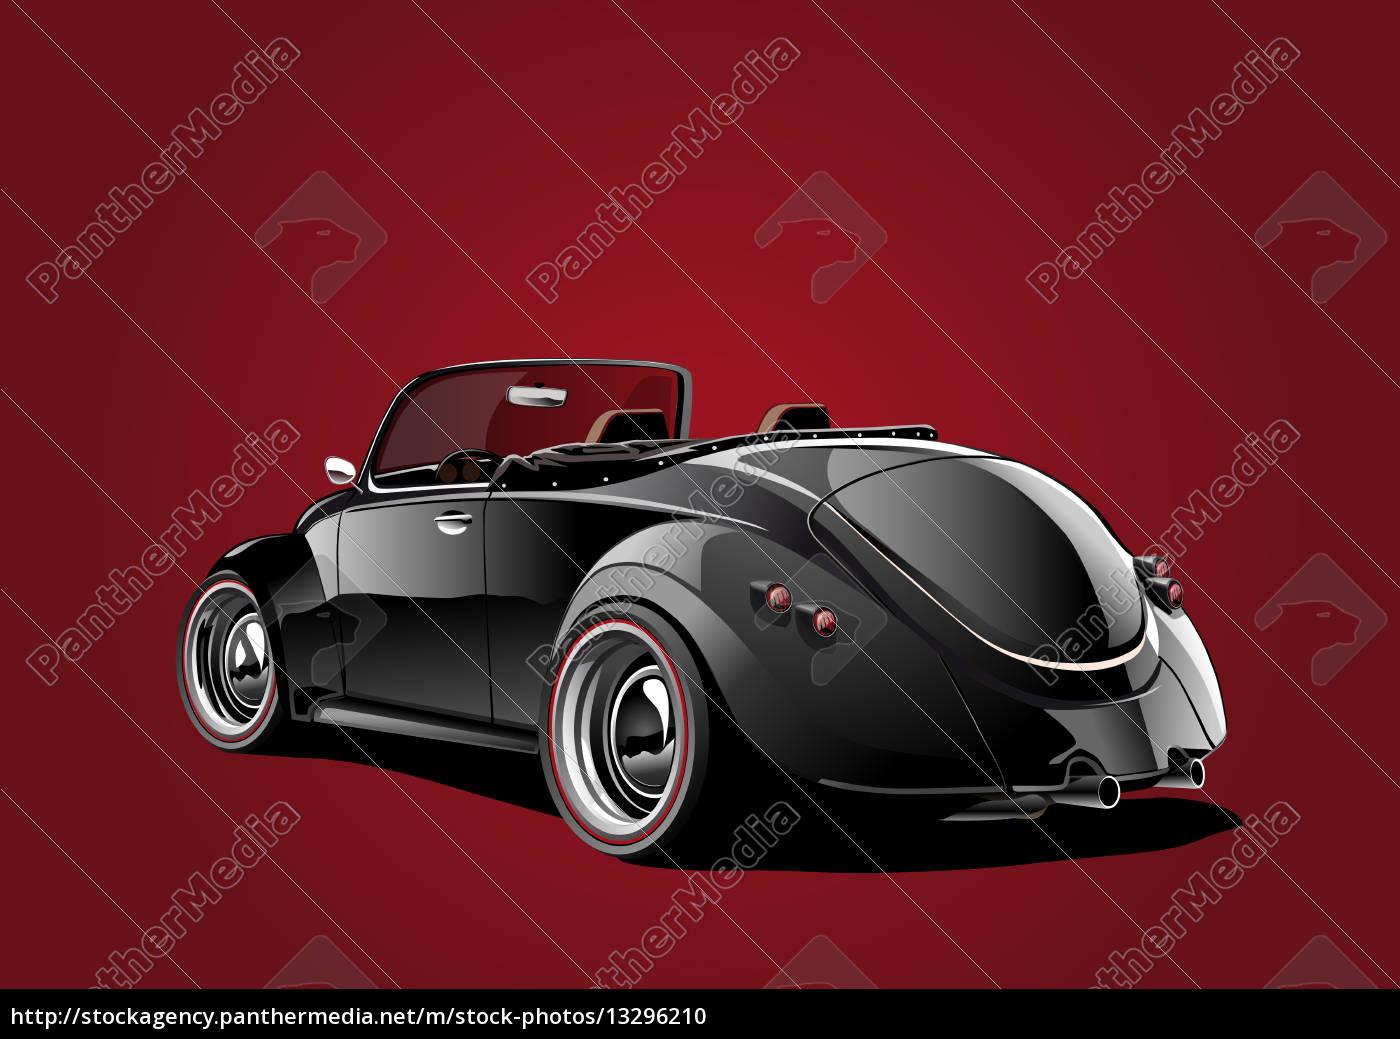 black-cabrio-neulampeai - 13296210